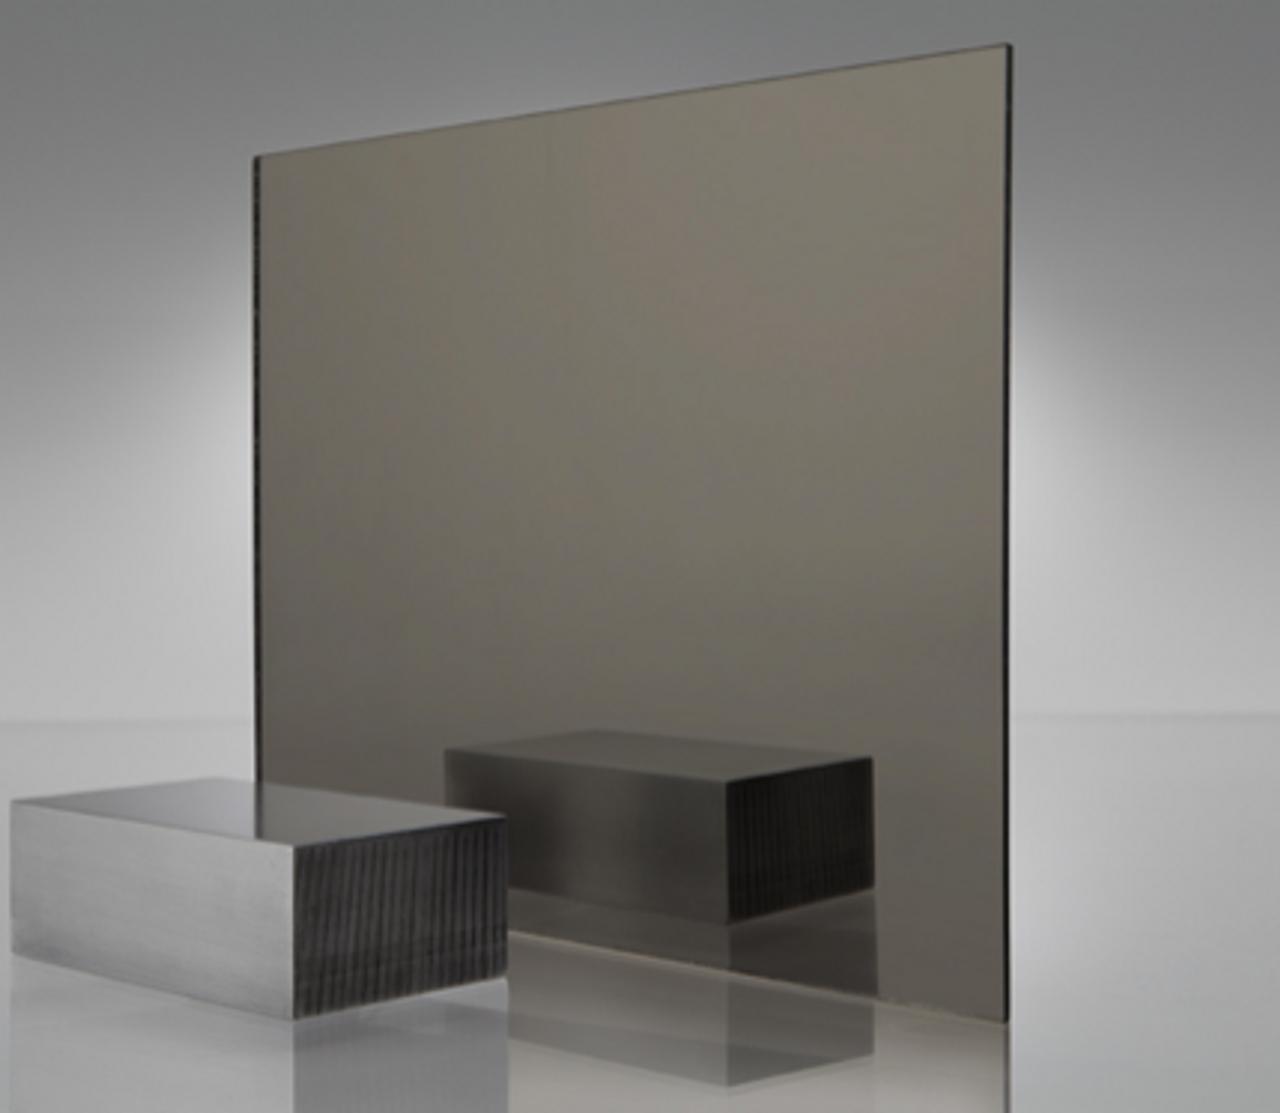 4x8' Mirrored Acrylic BRONZE